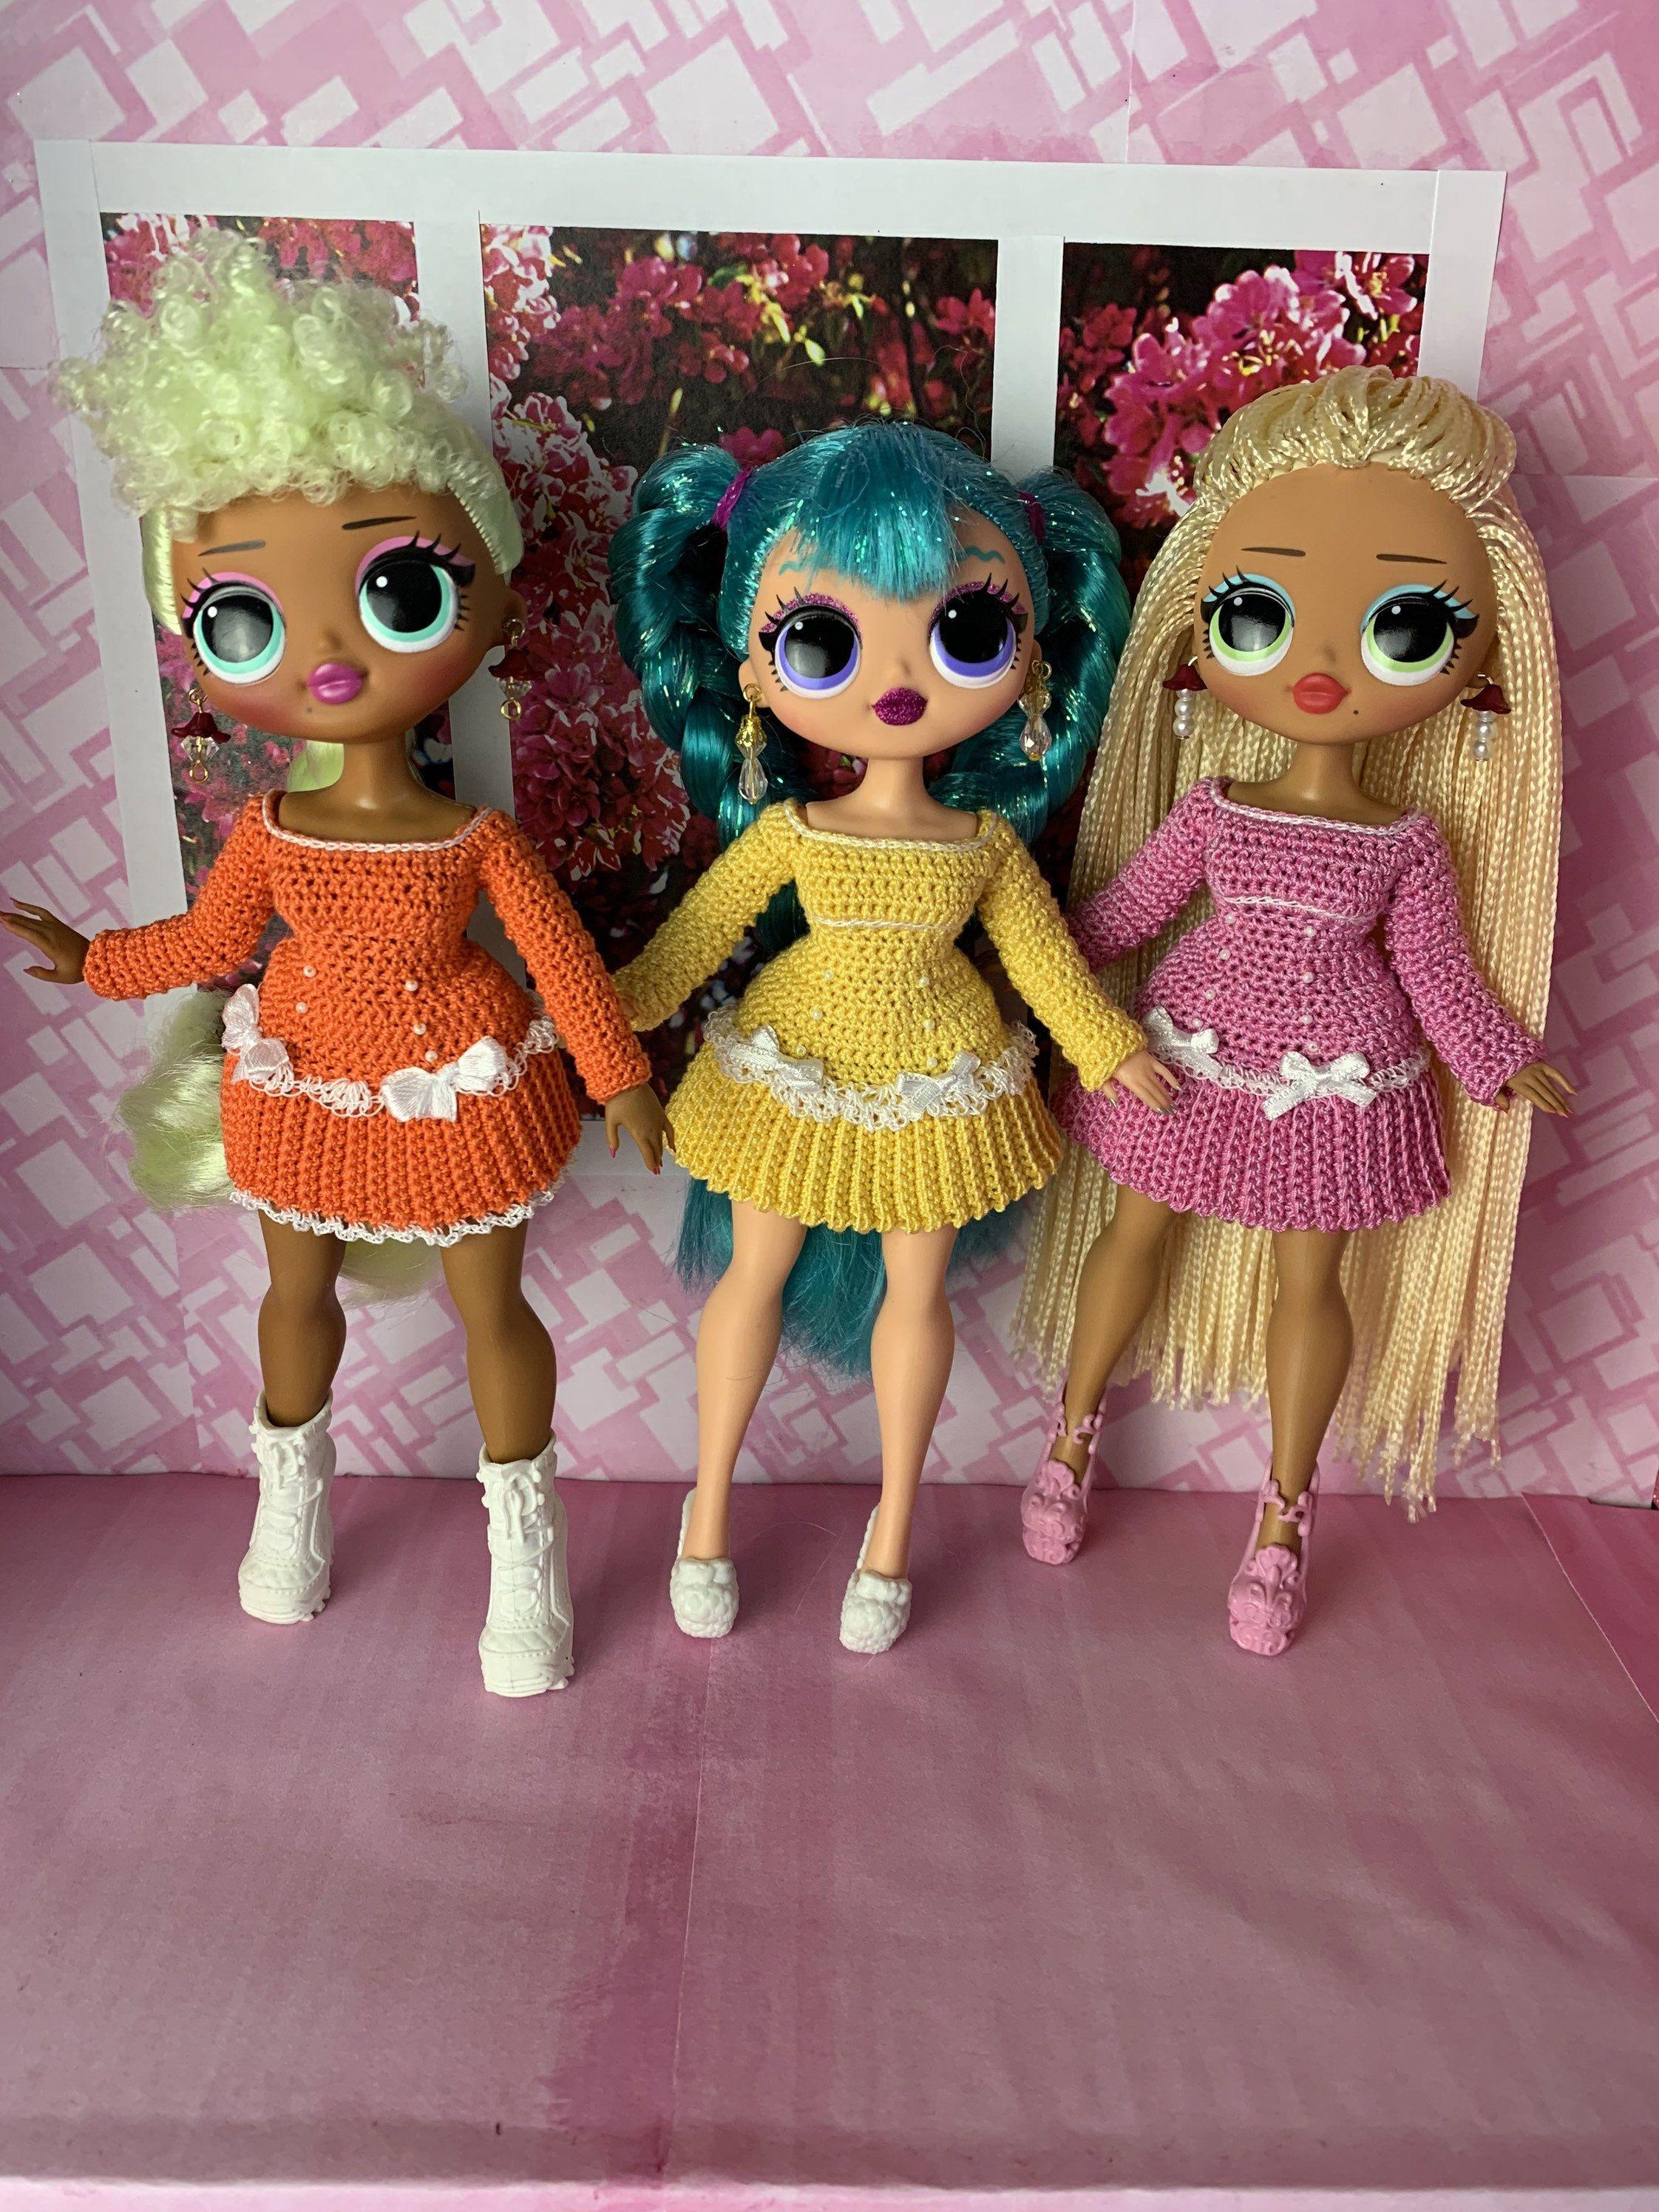 Custom order in 2020 lol dolls barbie dolls crochet dress